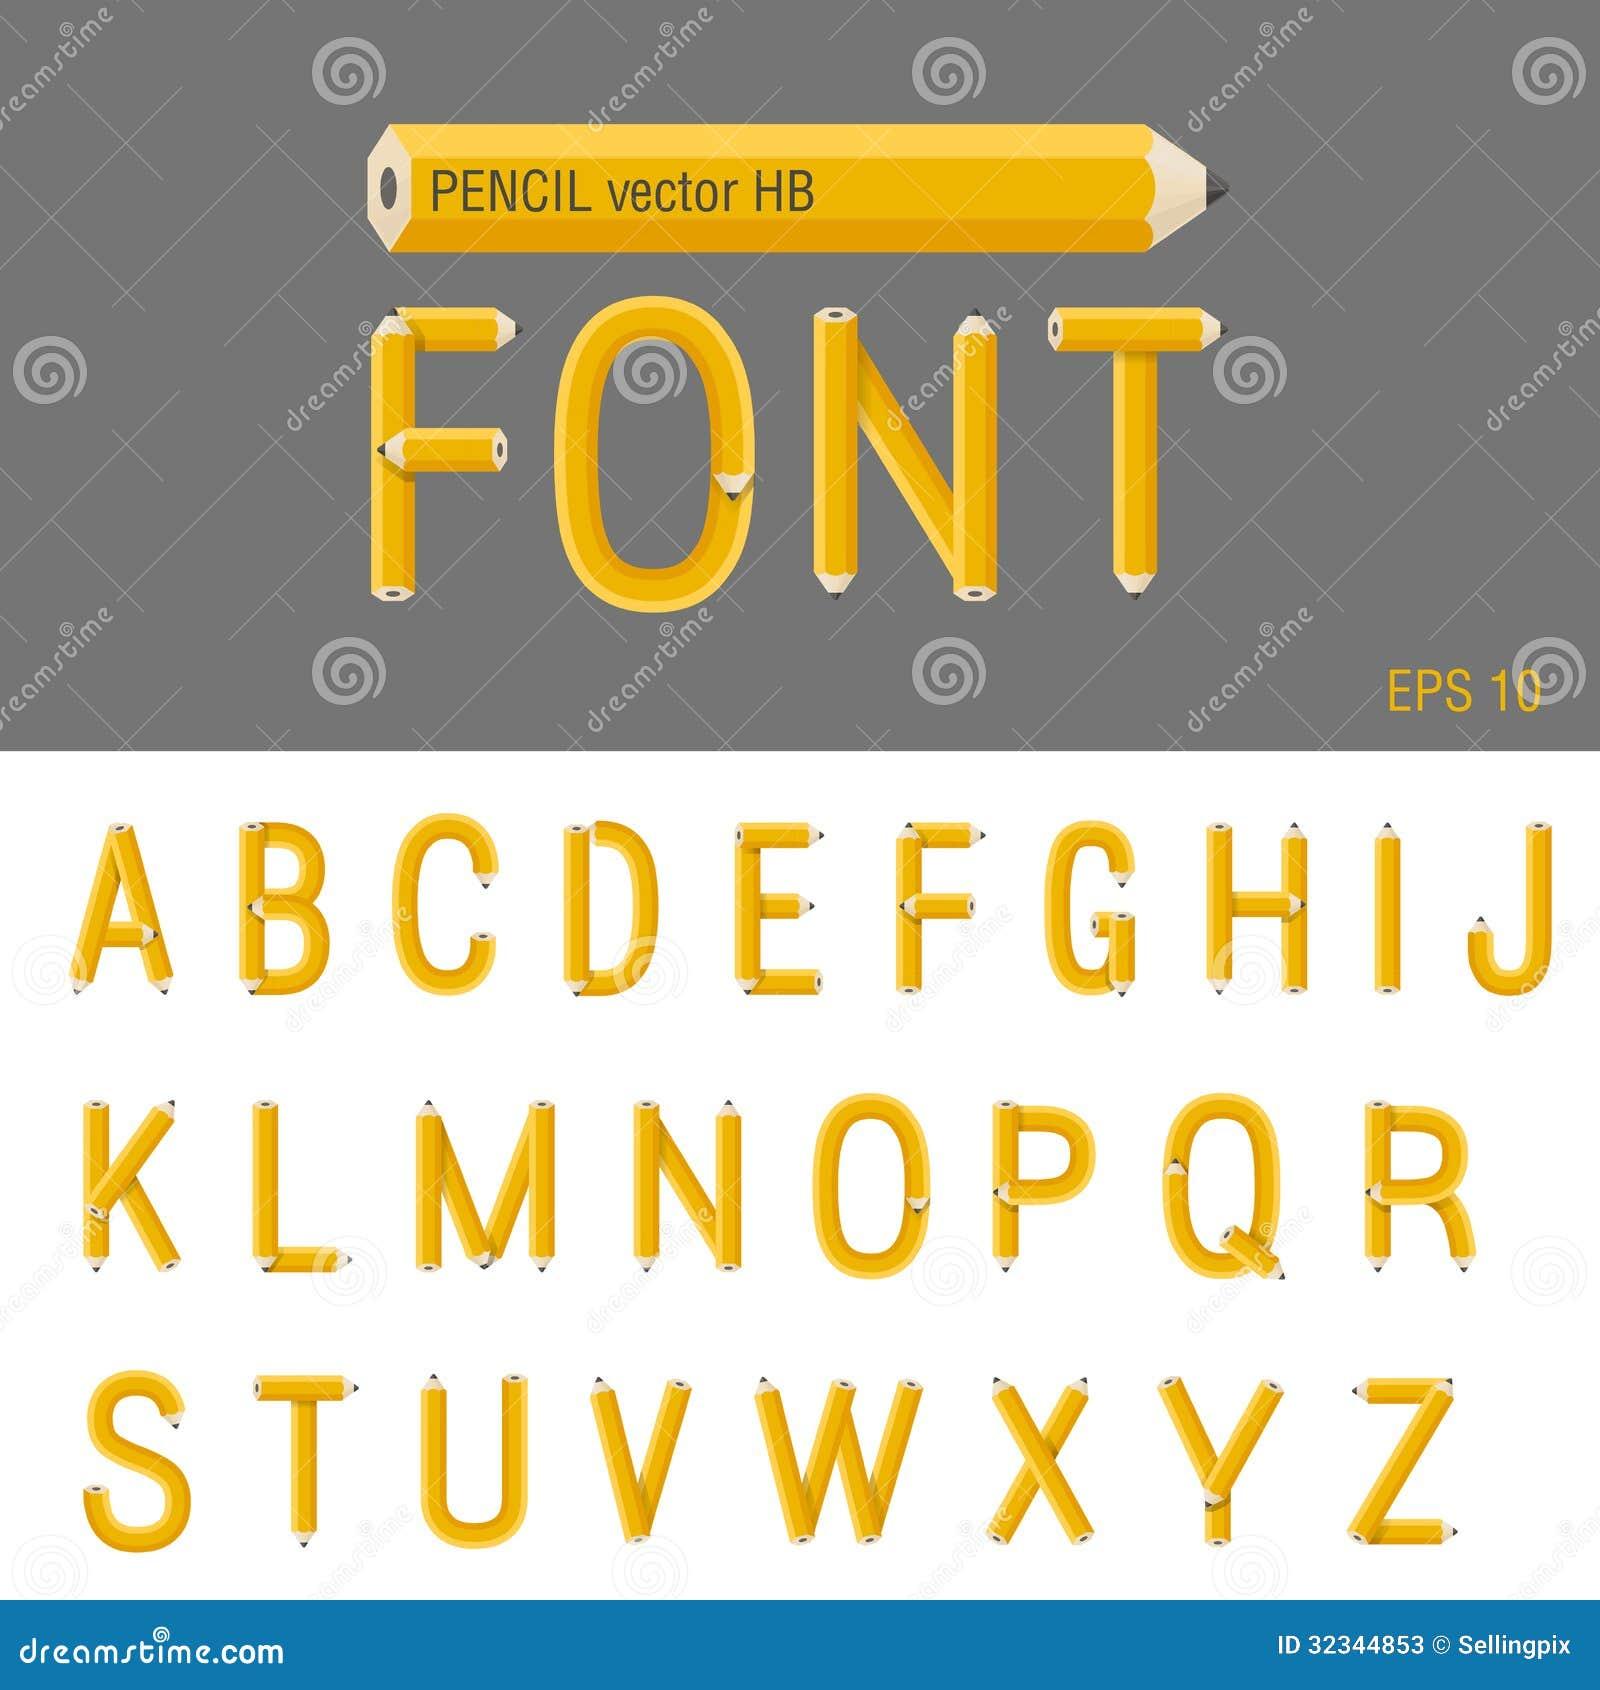 Pencil Font Vector  Creative Type Design  Educatio Stock